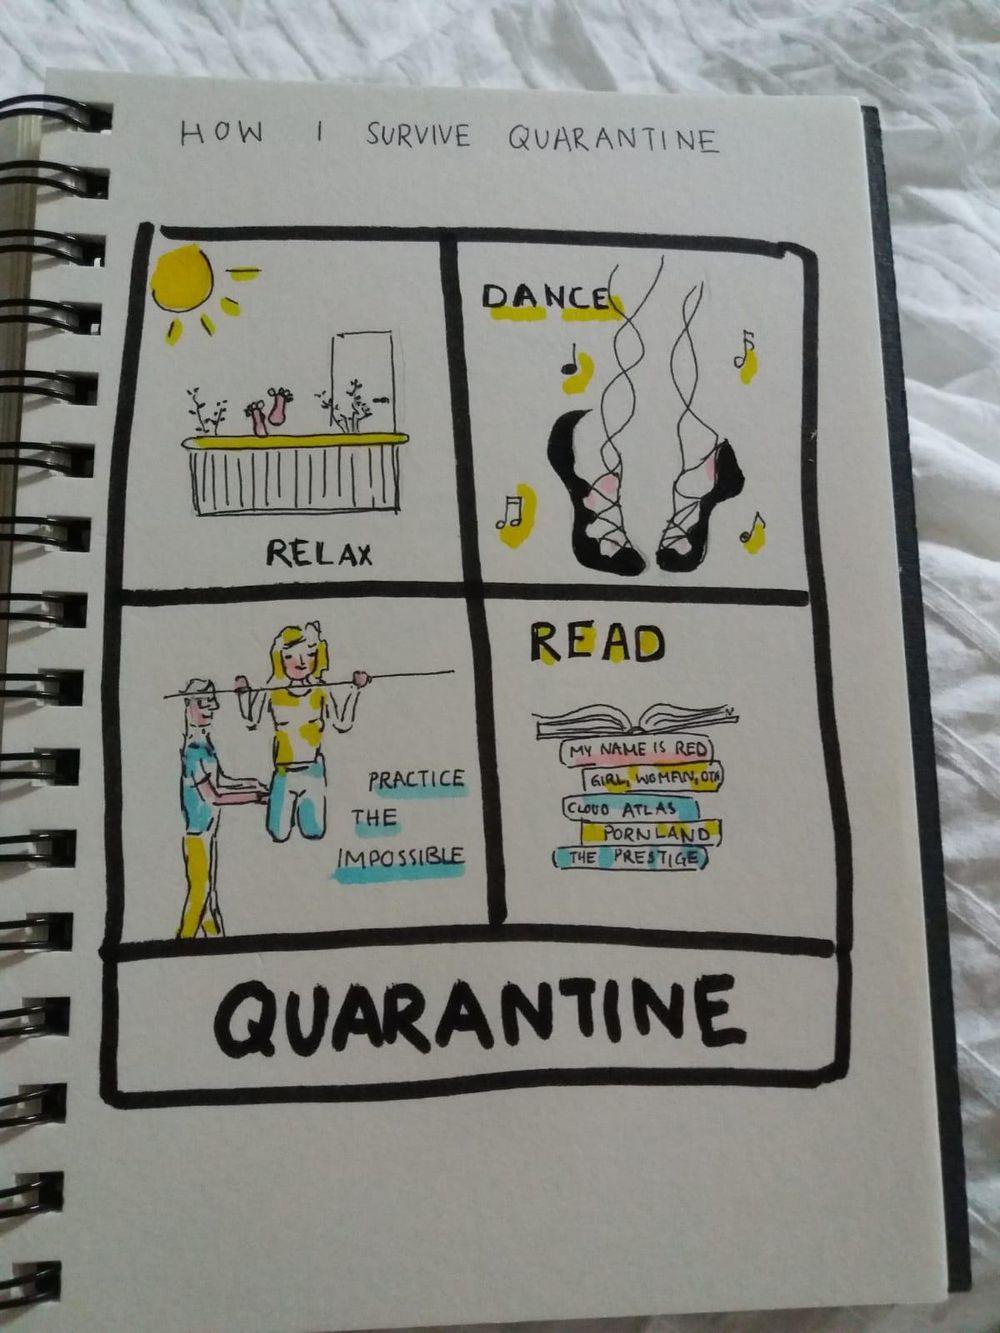 Germany Quarantine - image 4 - student project